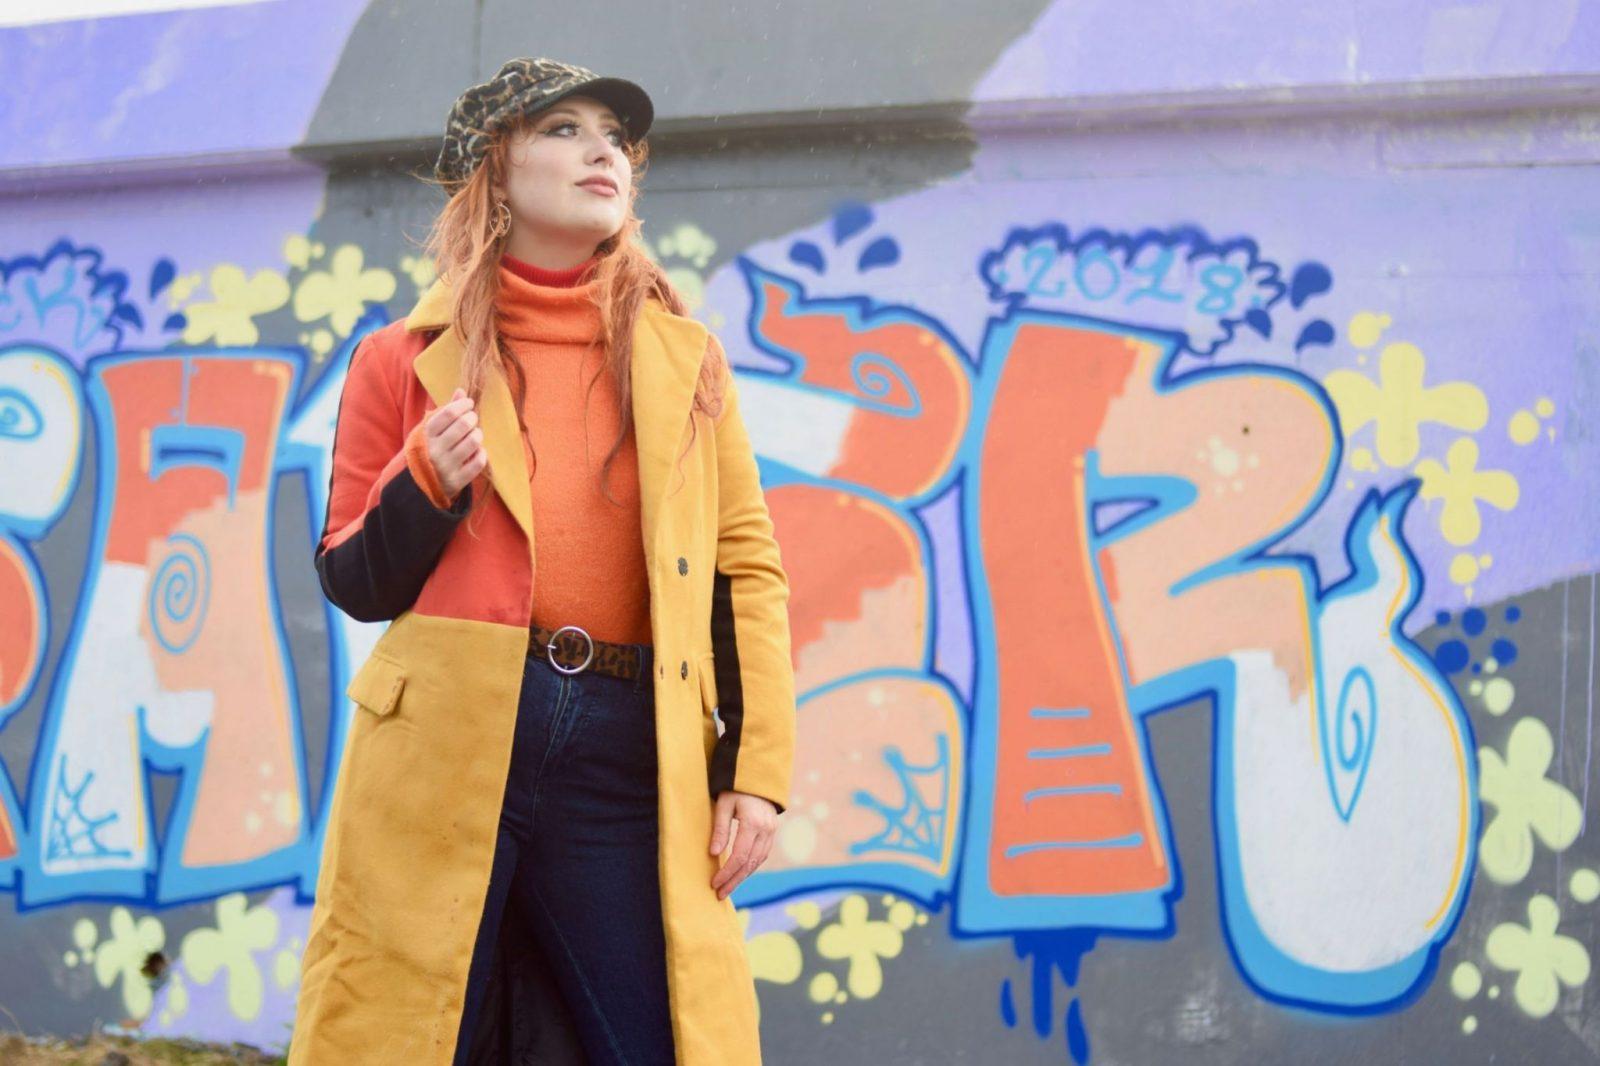 Blogger Twenty-Something City wears orange jumper and camel coat